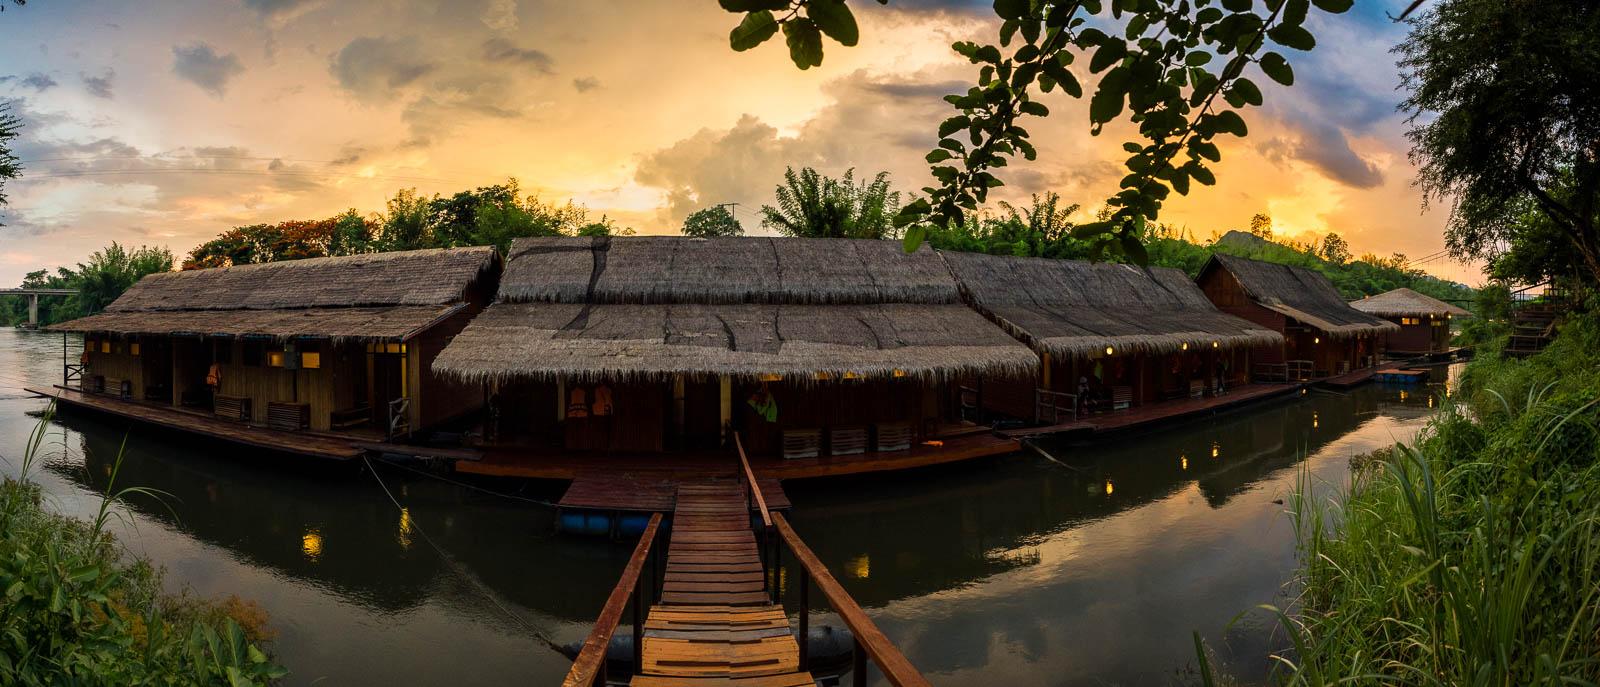 Houseboot on River Kwai